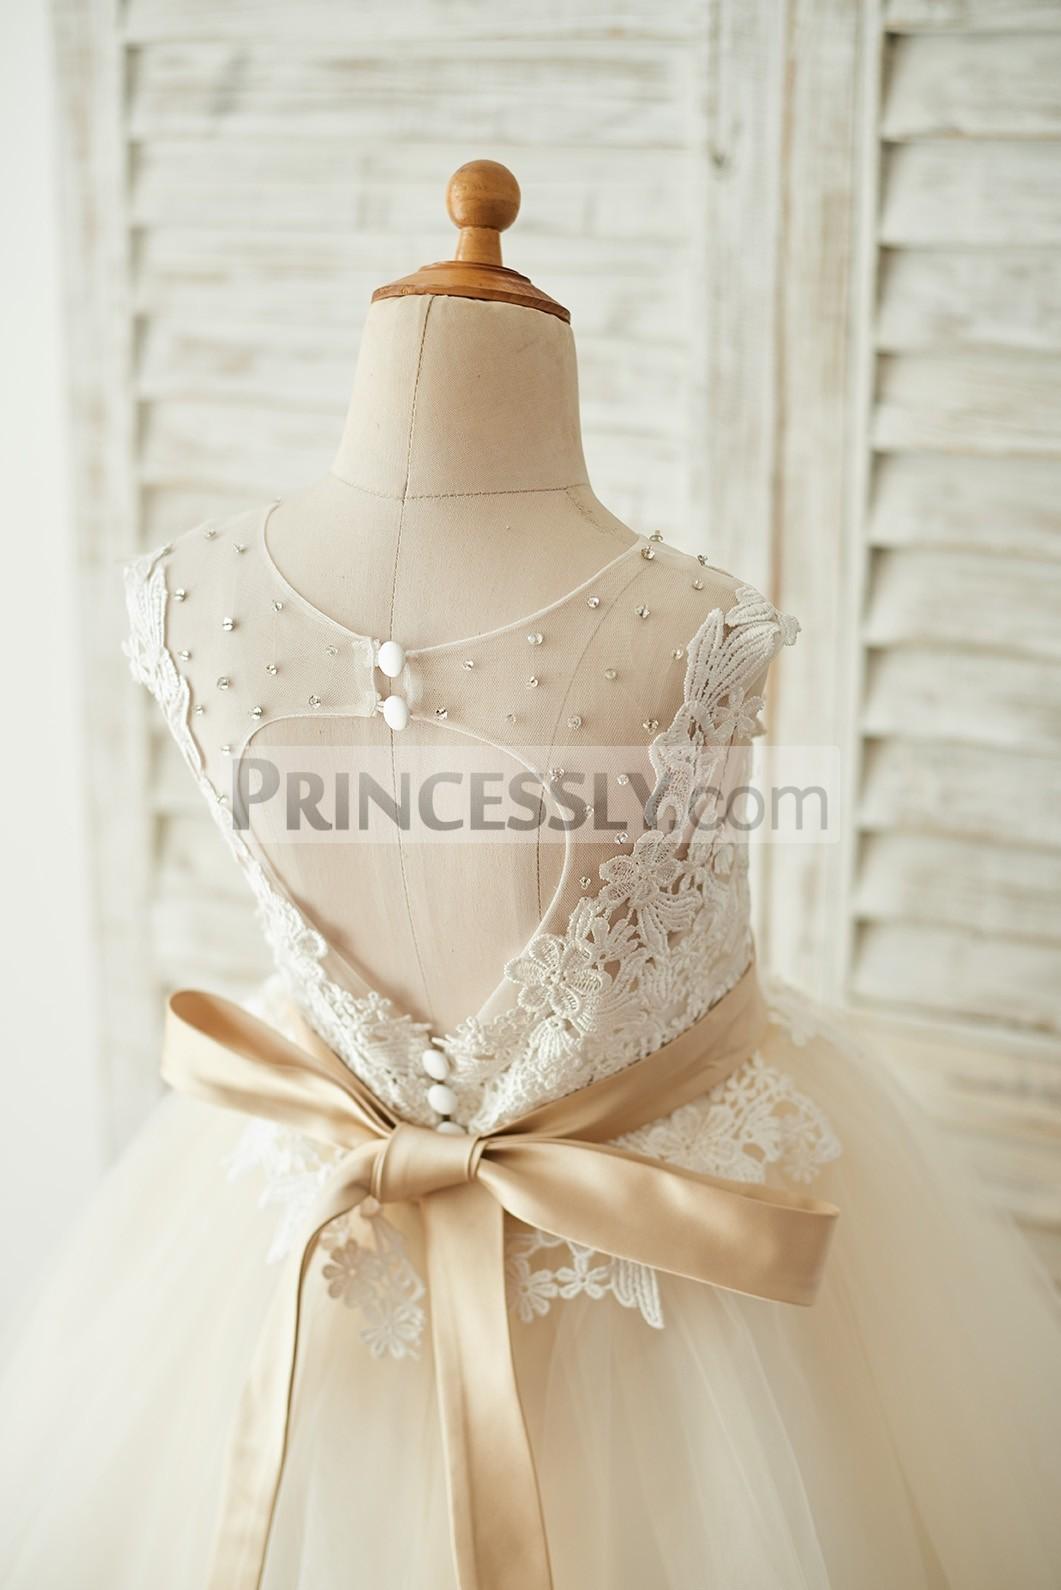 Princessly.com-K1003676-Ivory Lace Champagne Tulle Keyhole Back Wedding Party Flower Girl Dress with Belt-31